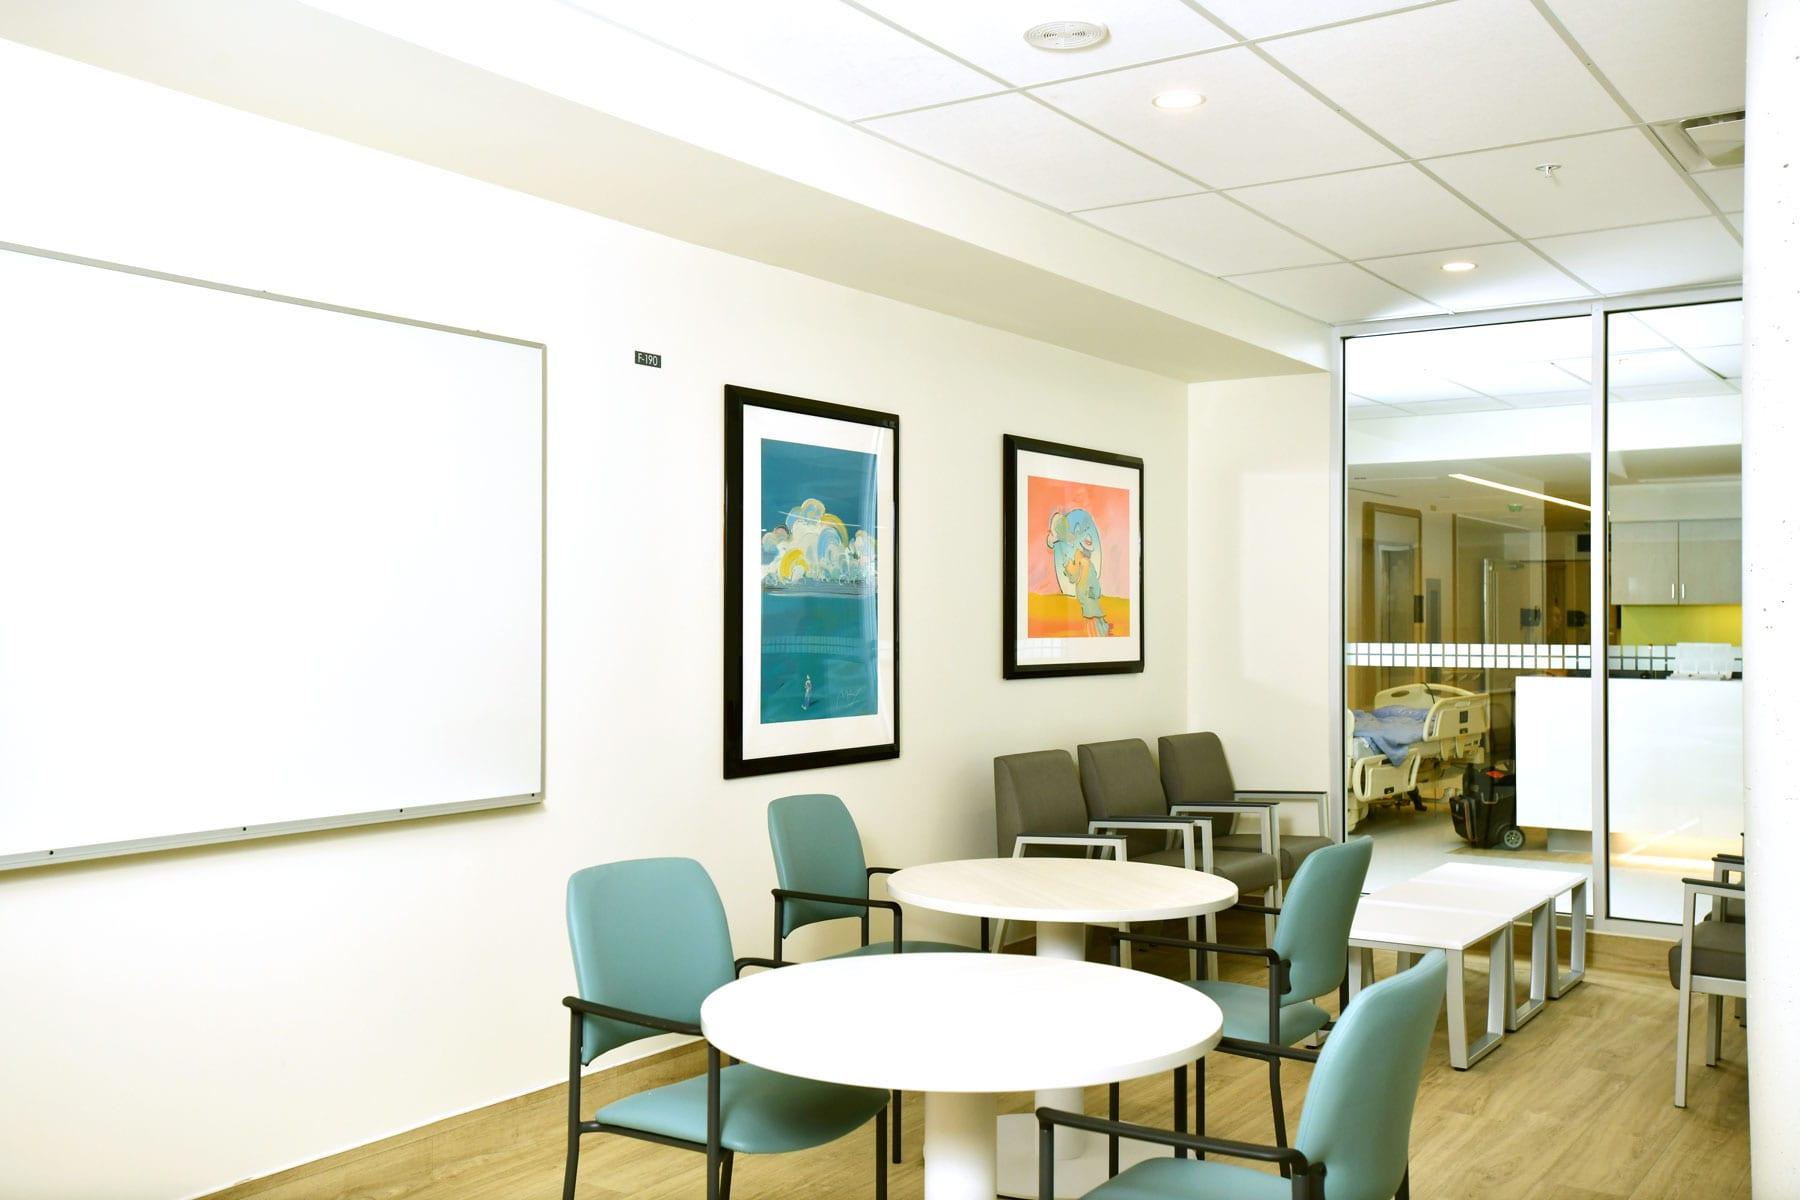 UBC hospital Koerner interior renewal construction project - meeting room